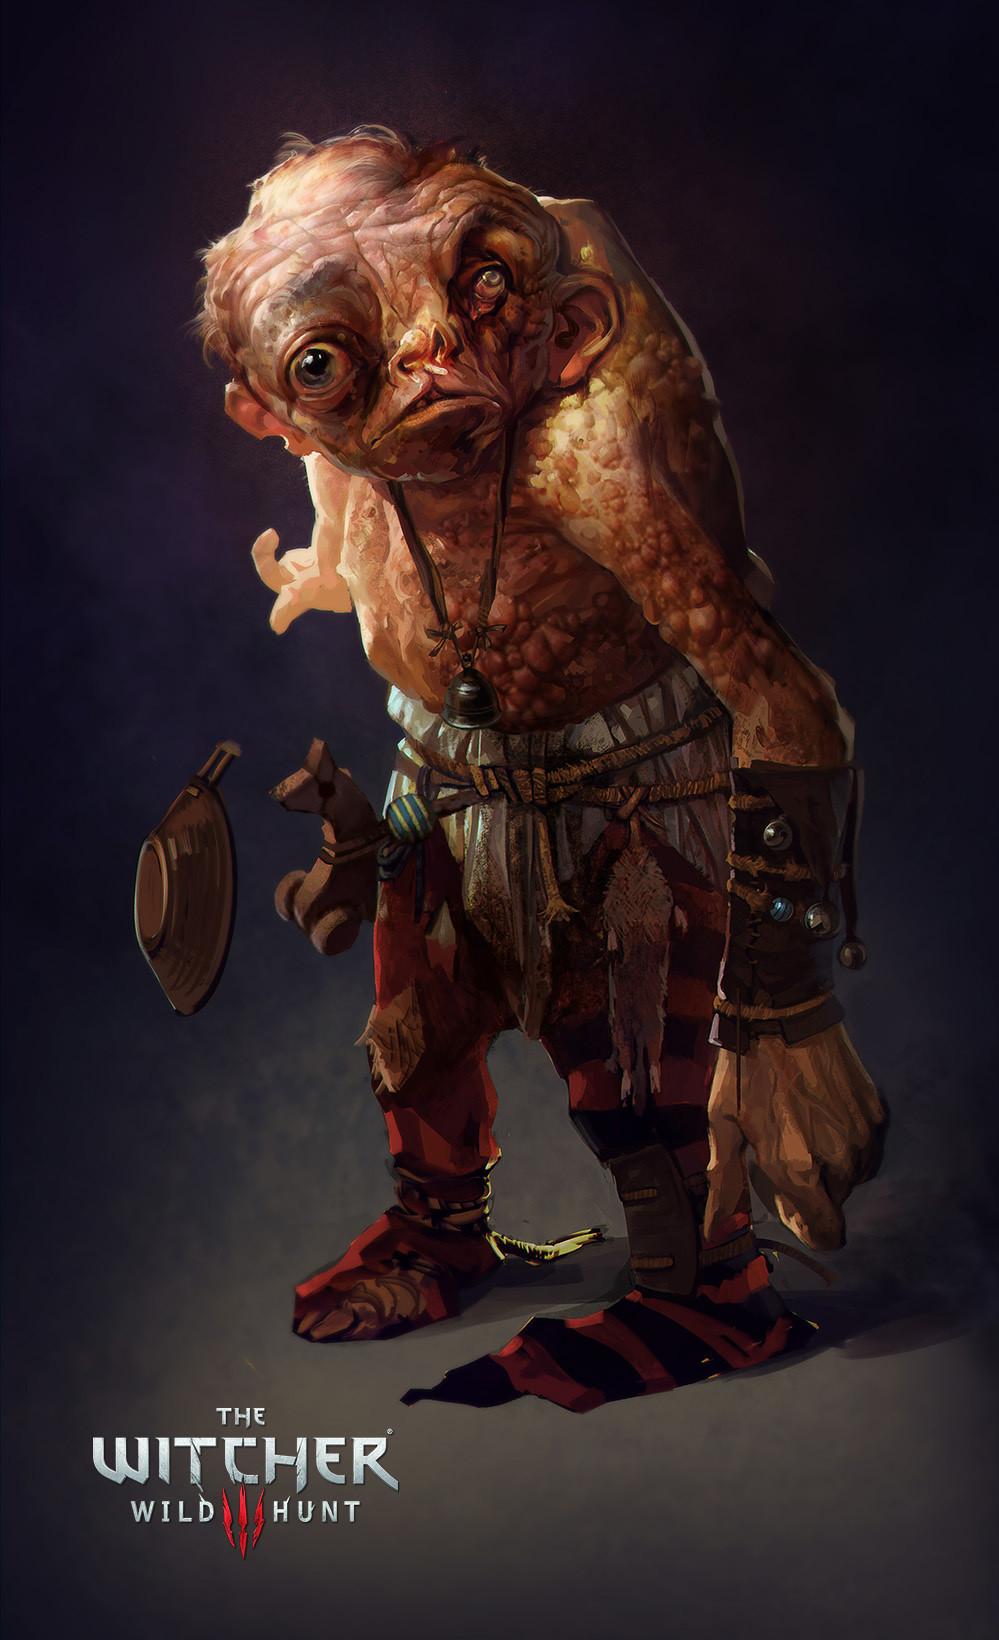 Uma - The Witcher 3 Wild Hunt